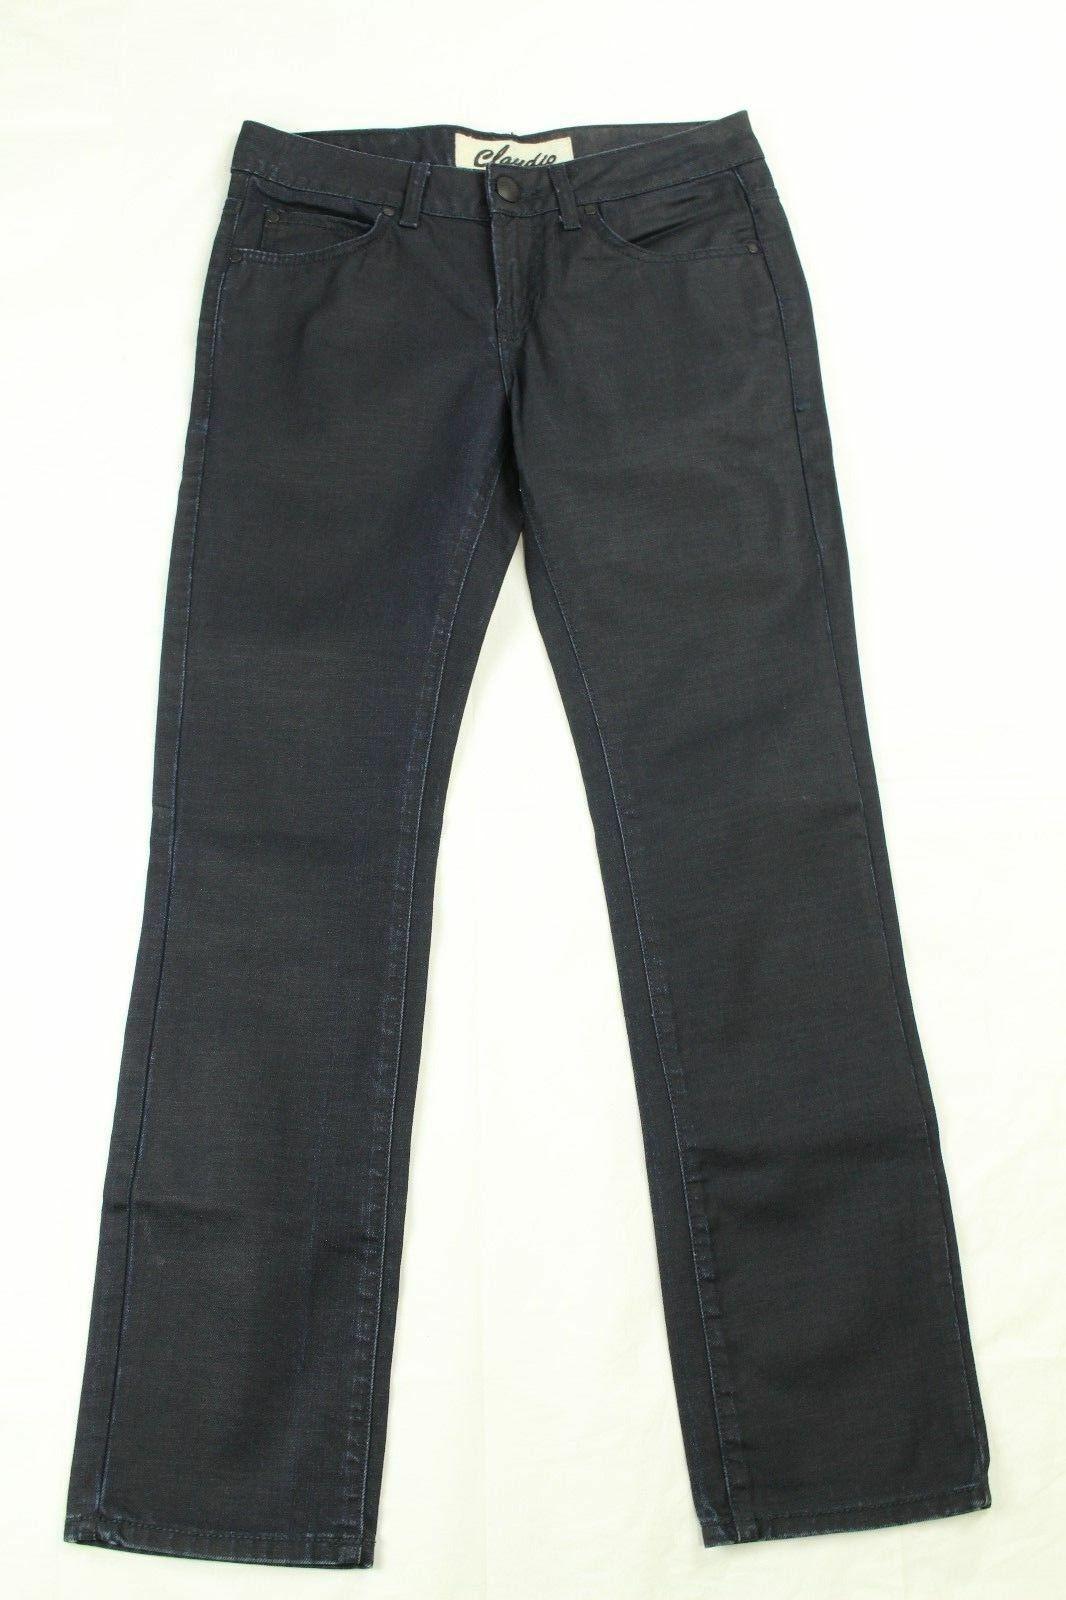 Claudio Milano Men's Jeans Straight Leg Dark Wash Retail